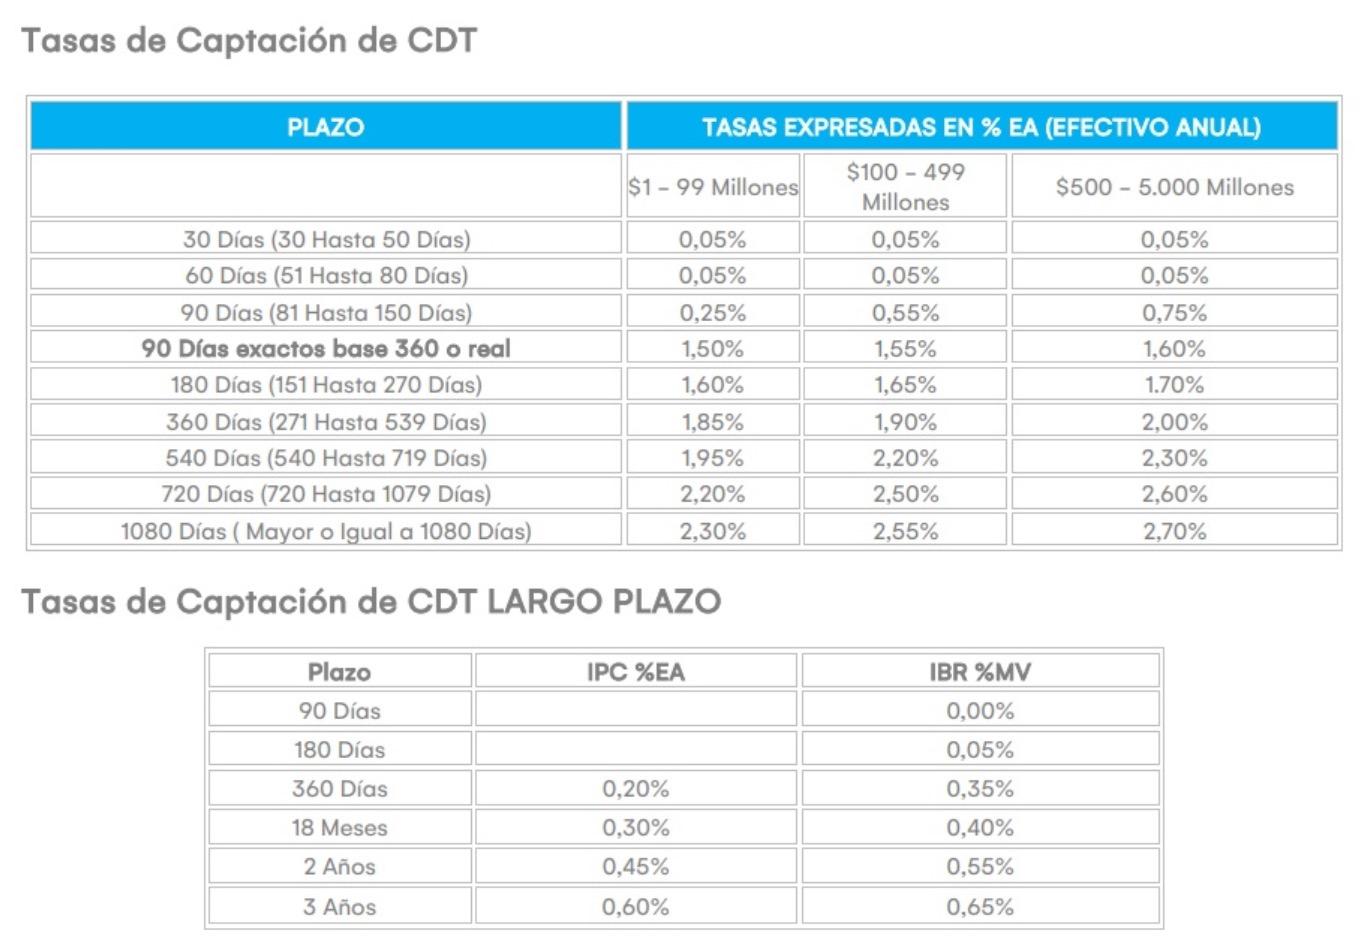 Tasas: CDT Banco de Occidente